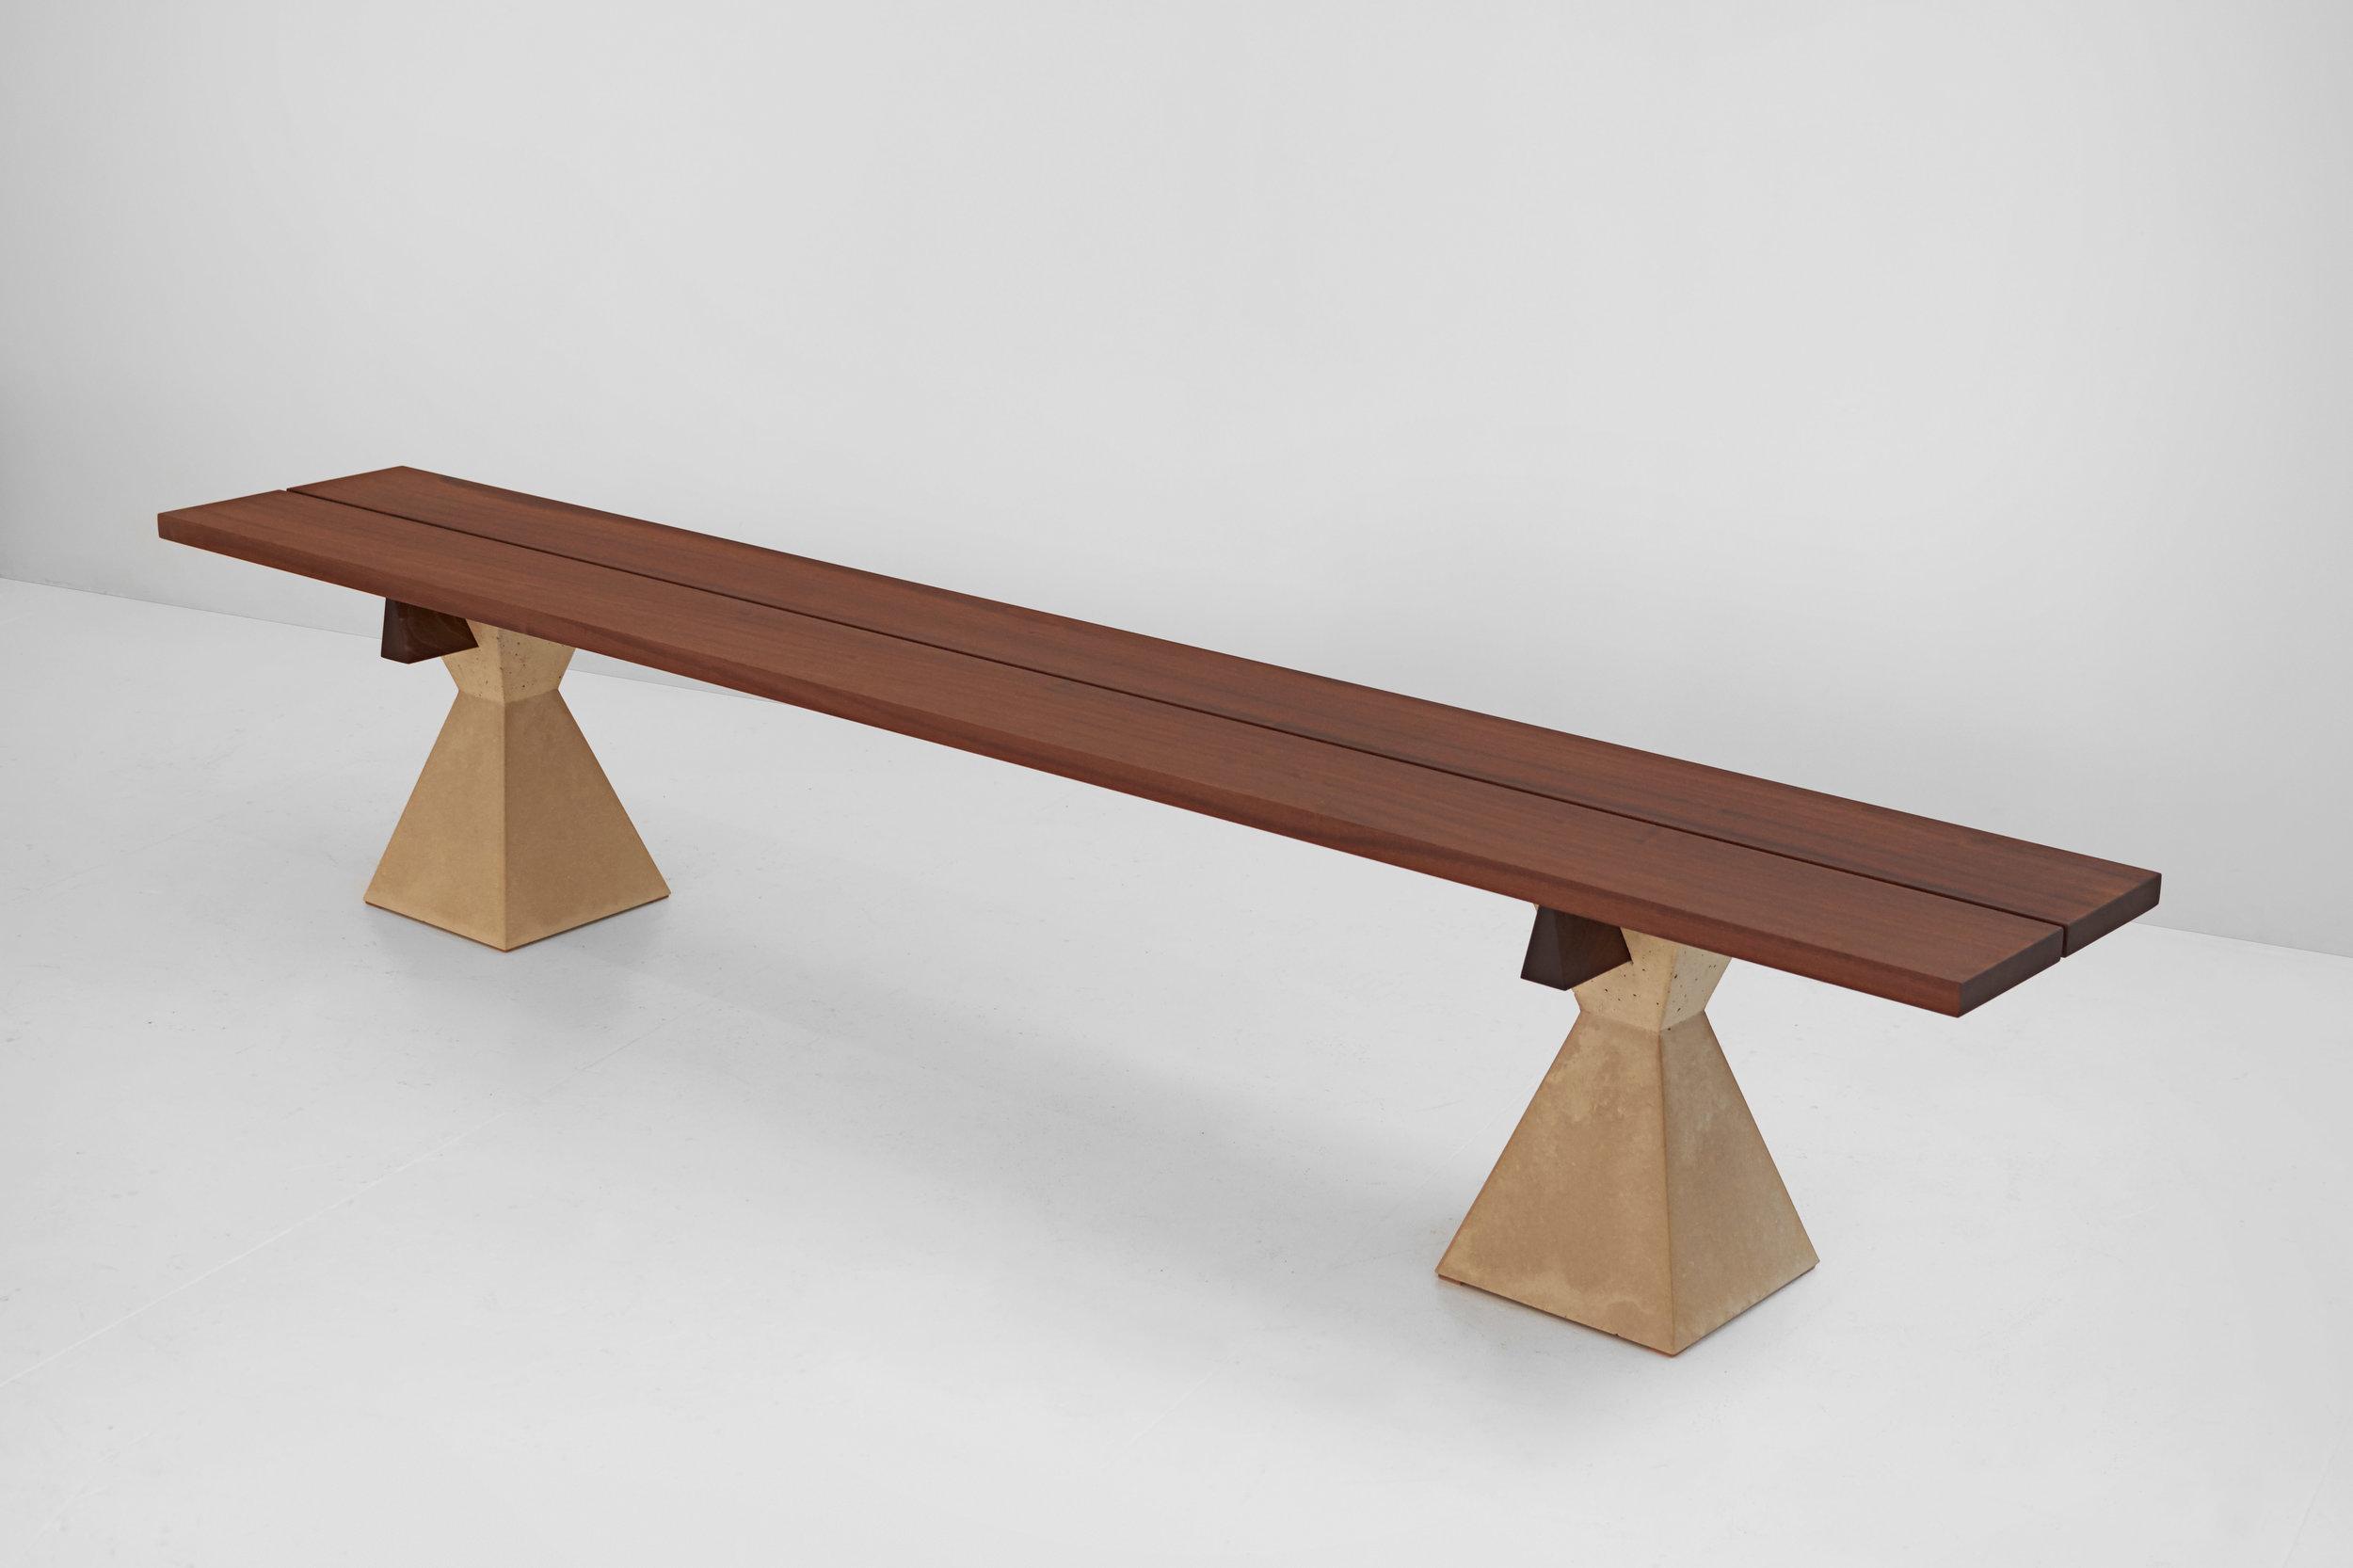 Dovetail Bench-1.jpg